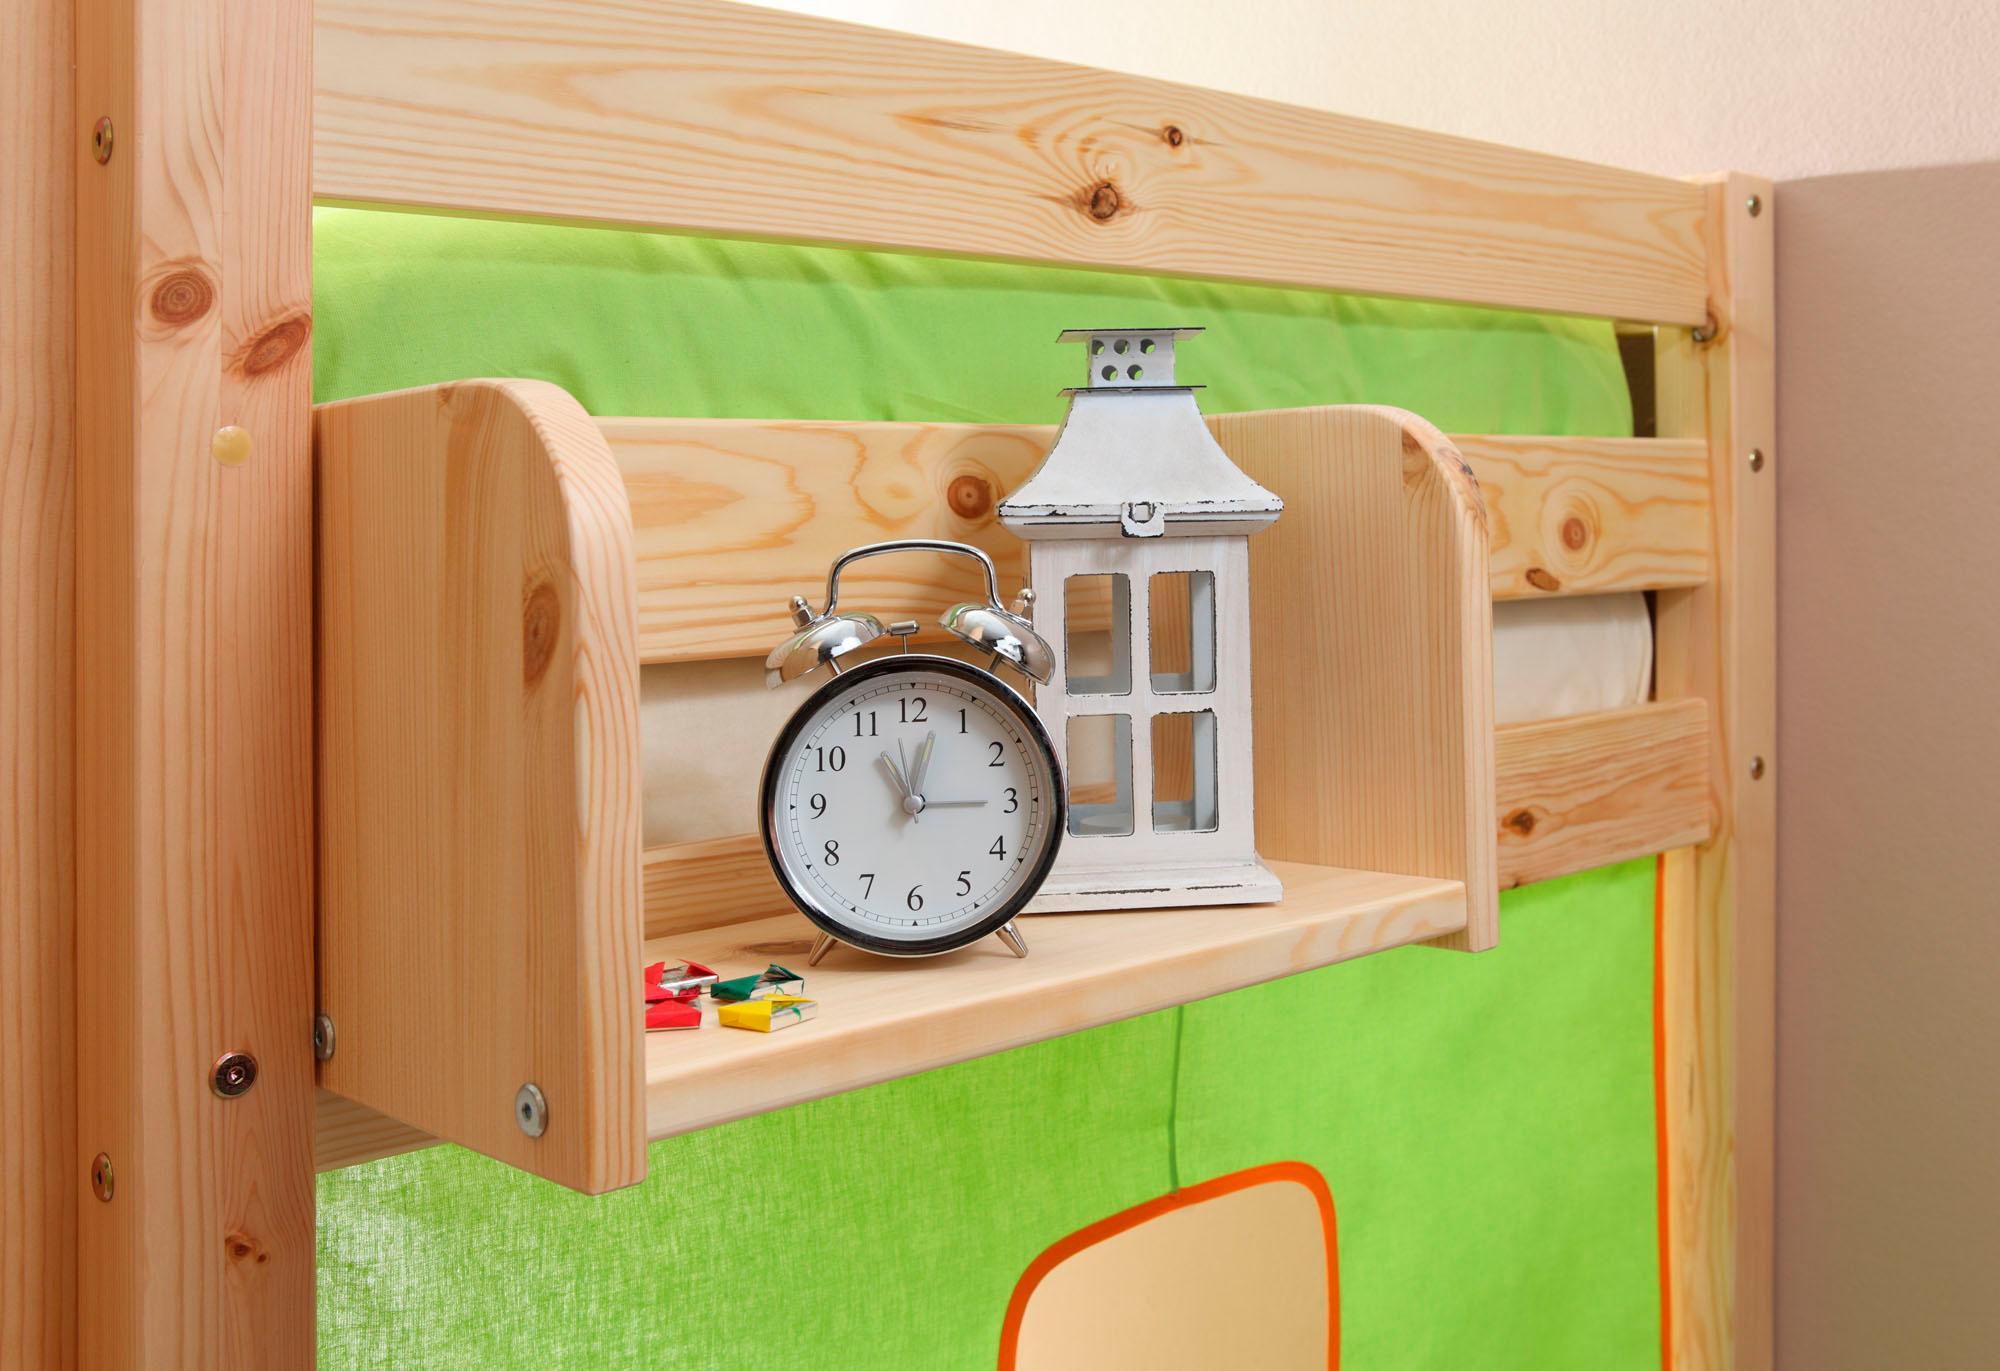 Ticaa Einhängeregal in verschiedenen Breiten, Kiefer | Kinderzimmer > Kinderzimmerregale | Natur | Metall - Kiefer | TICAA